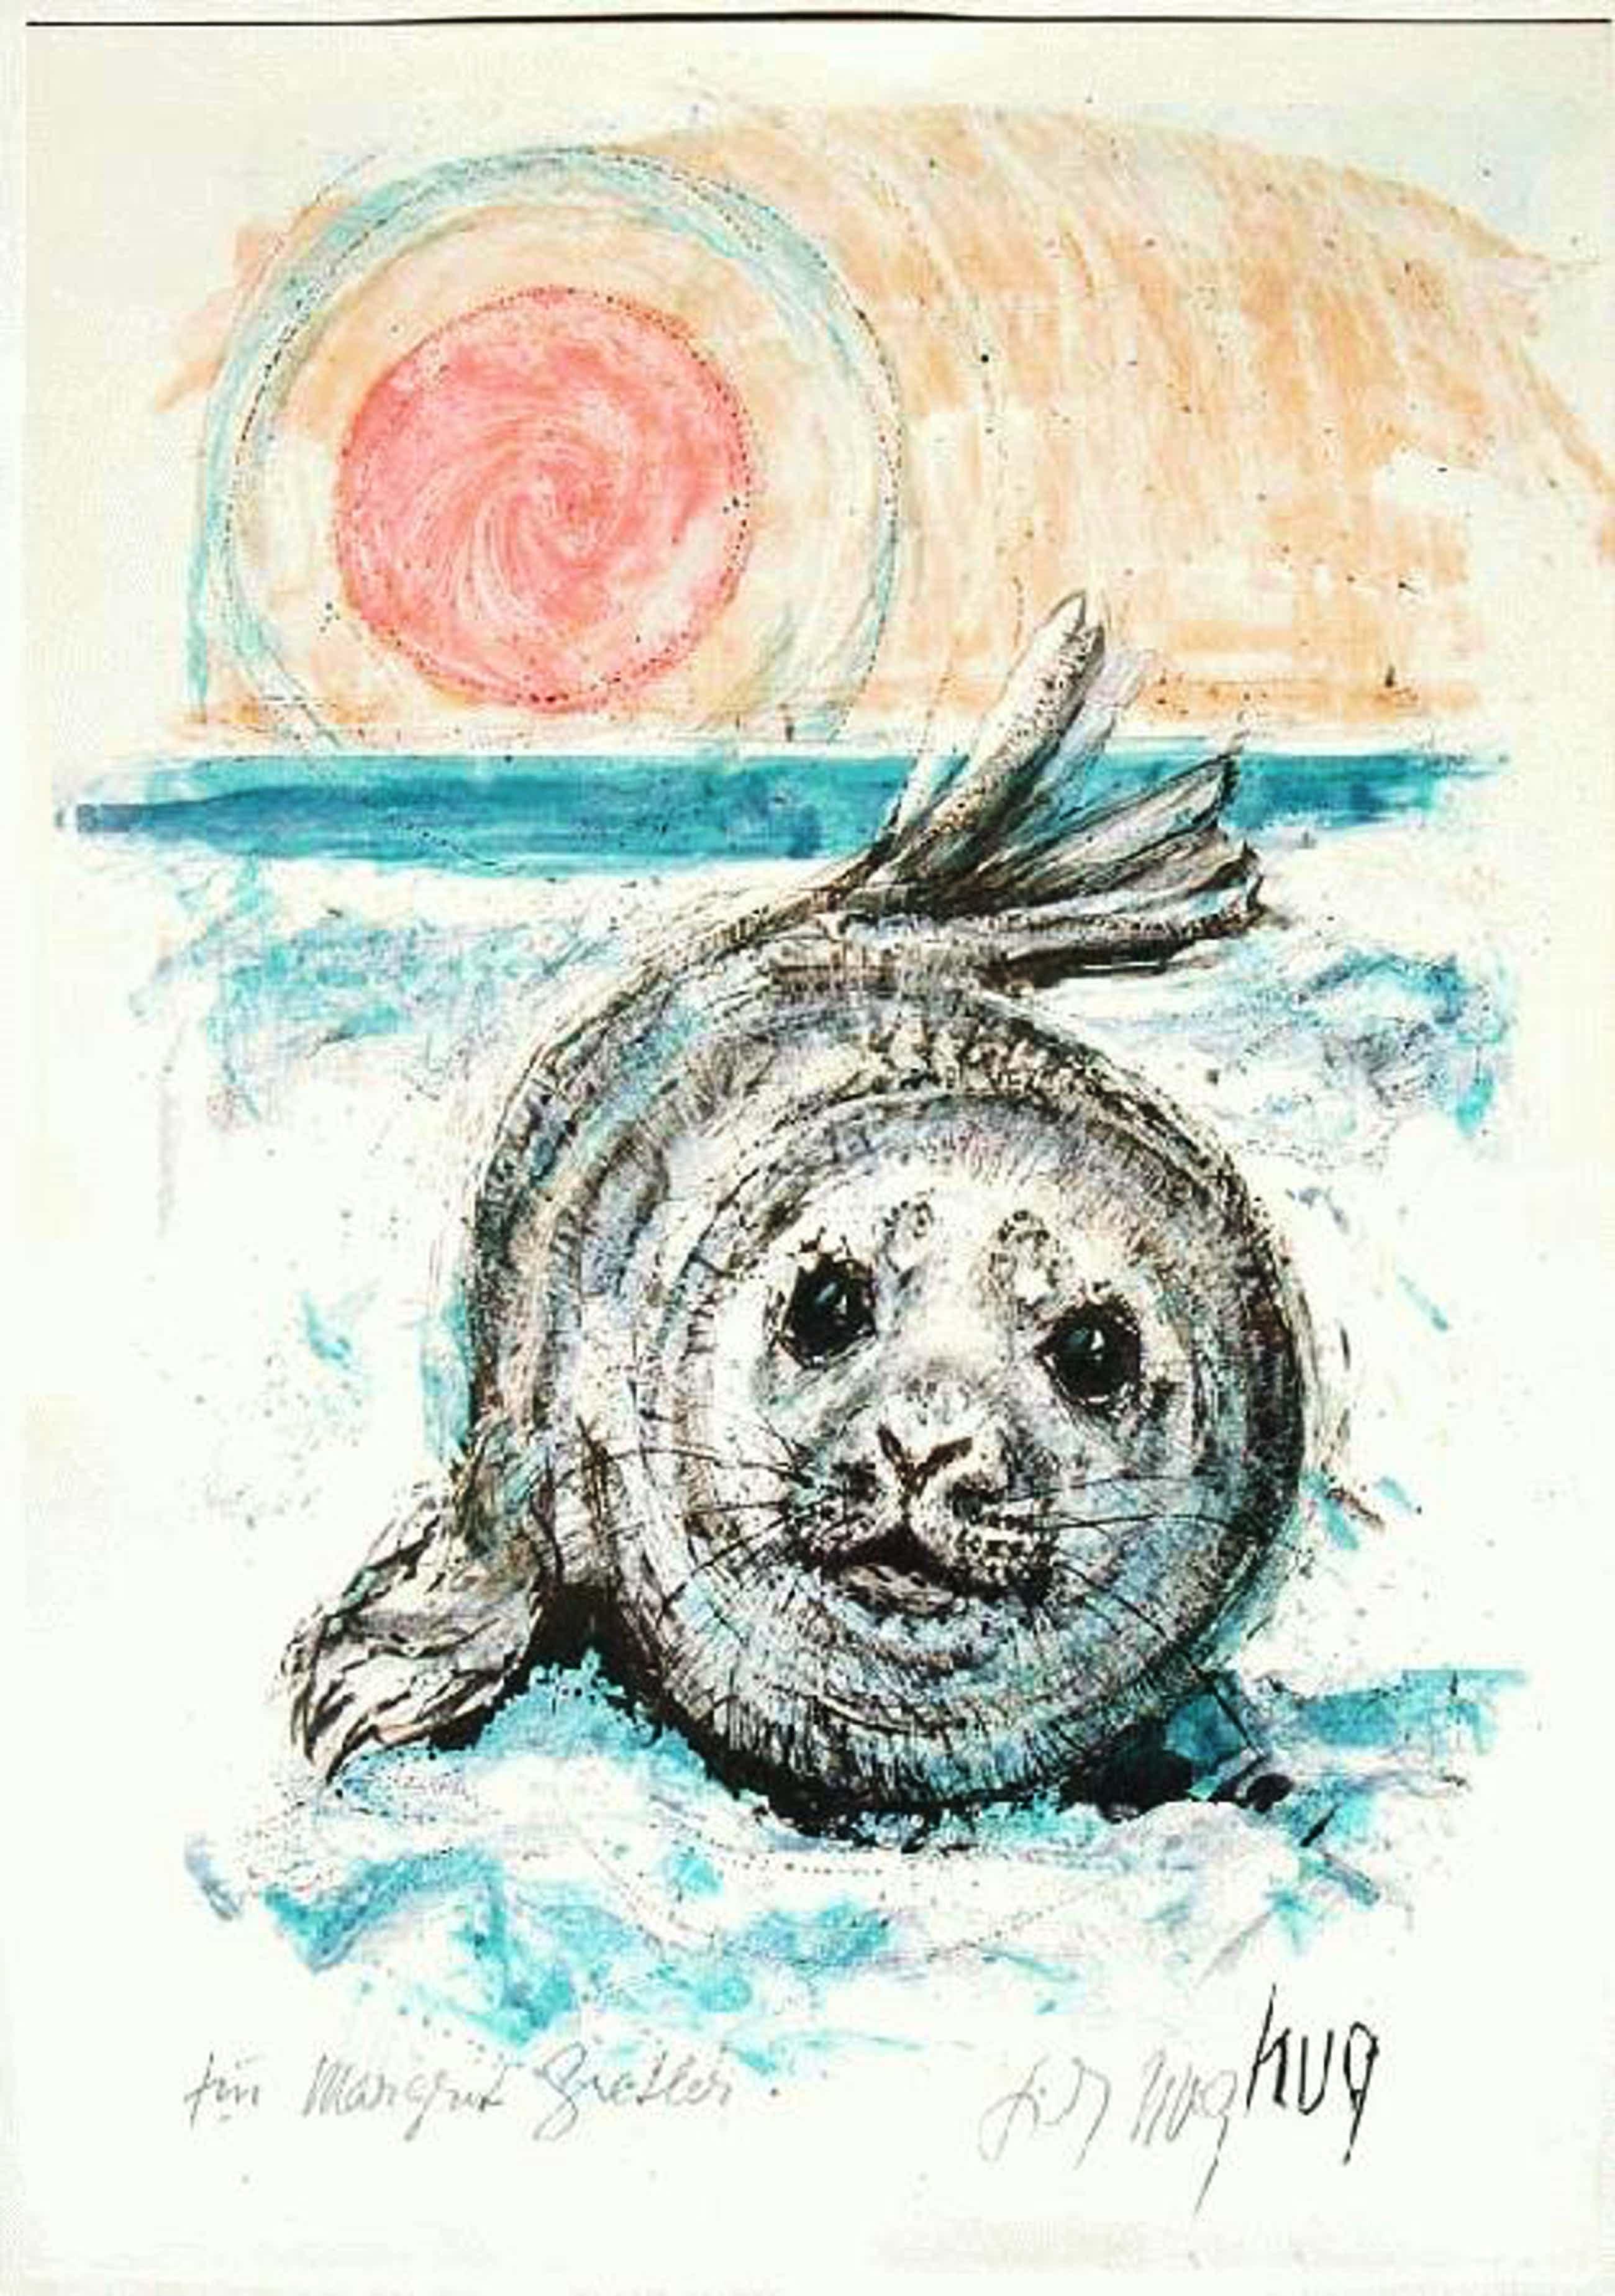 Fritz Rudolf Hug - -Seehund- Farblithografie, handsigniert, Widmung kopen? Bied vanaf 190!